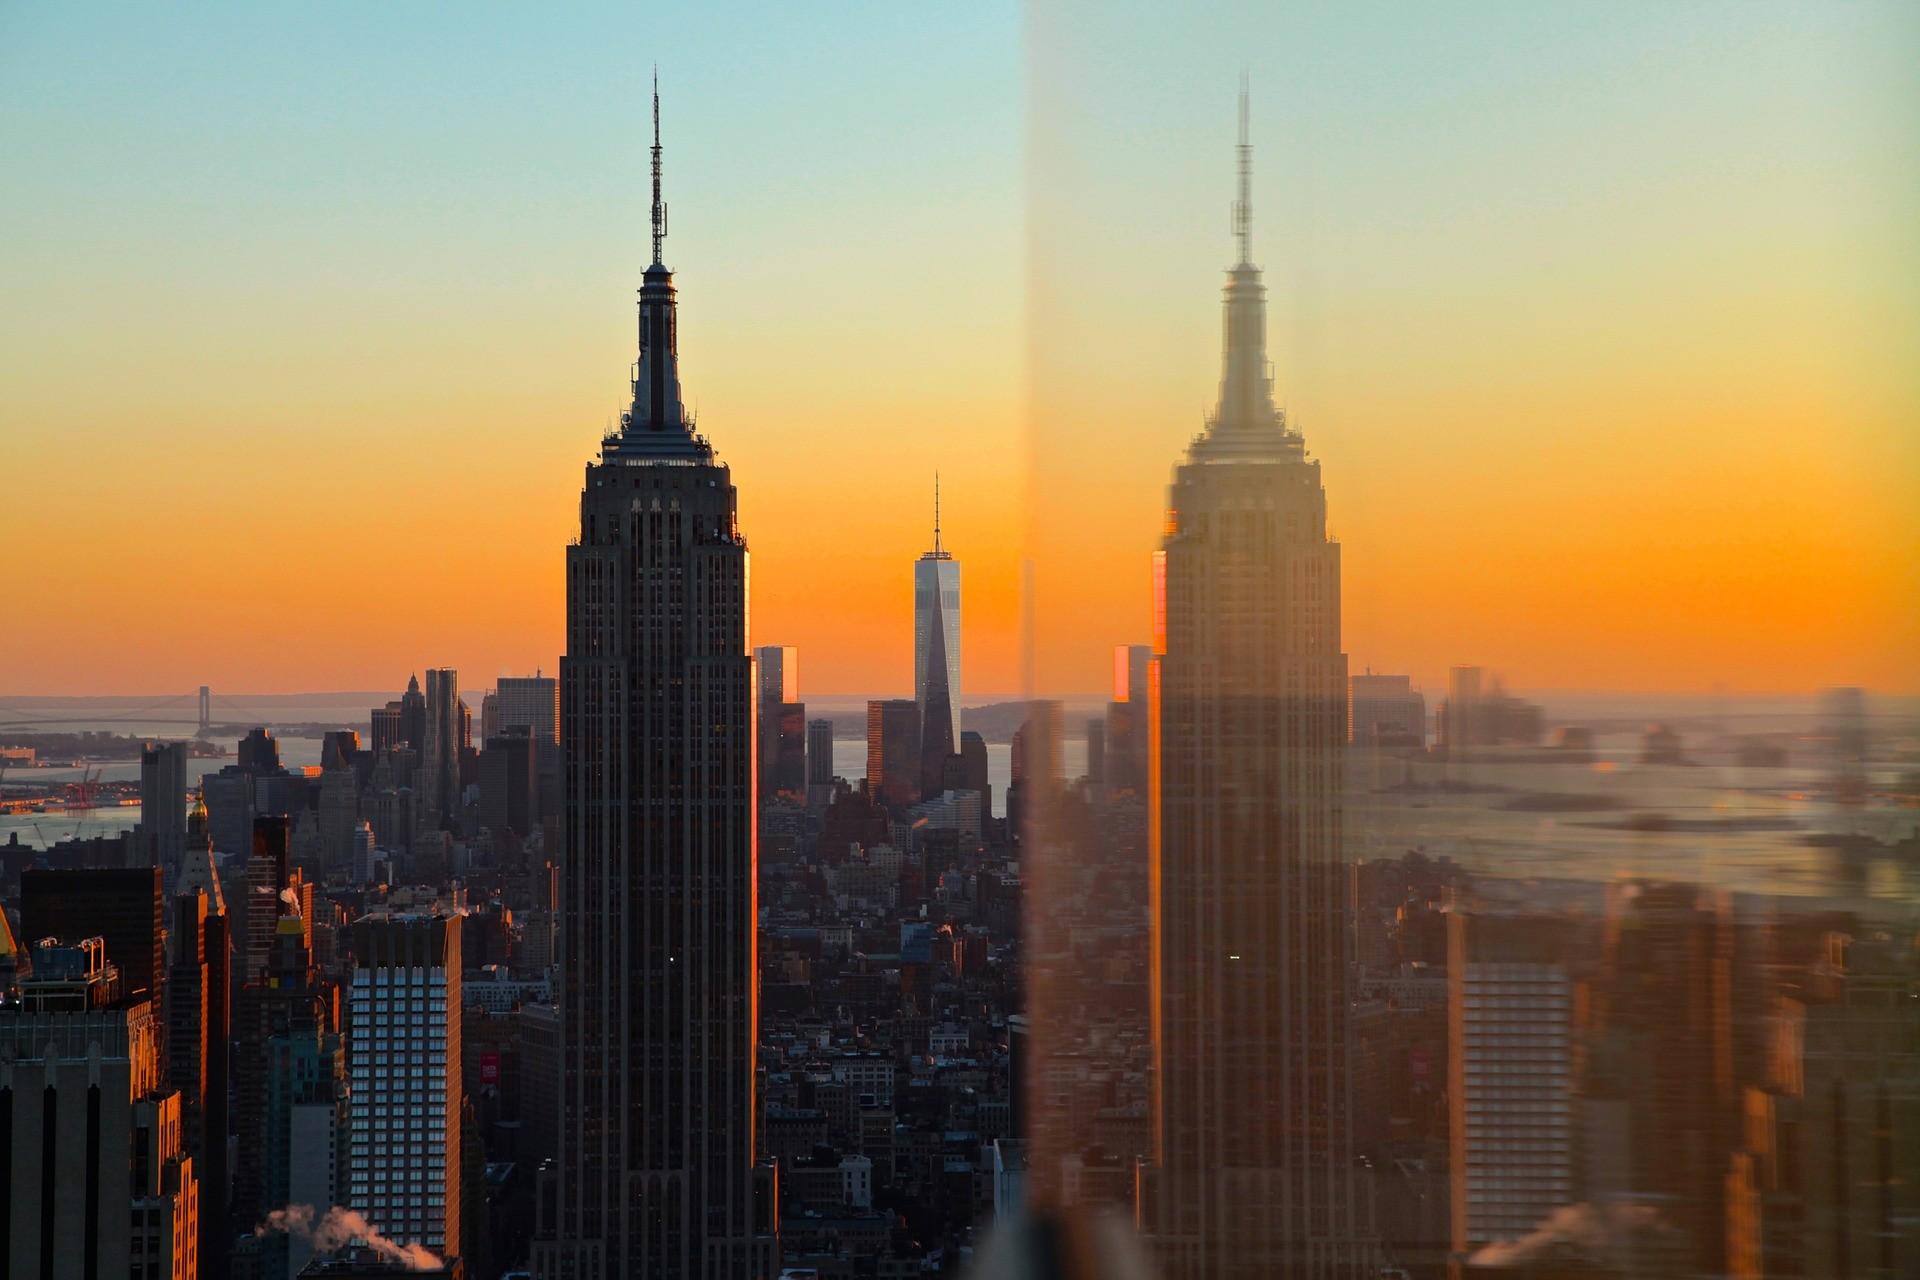 Hostel of the week: HI - New York City | HI Hostel Blog